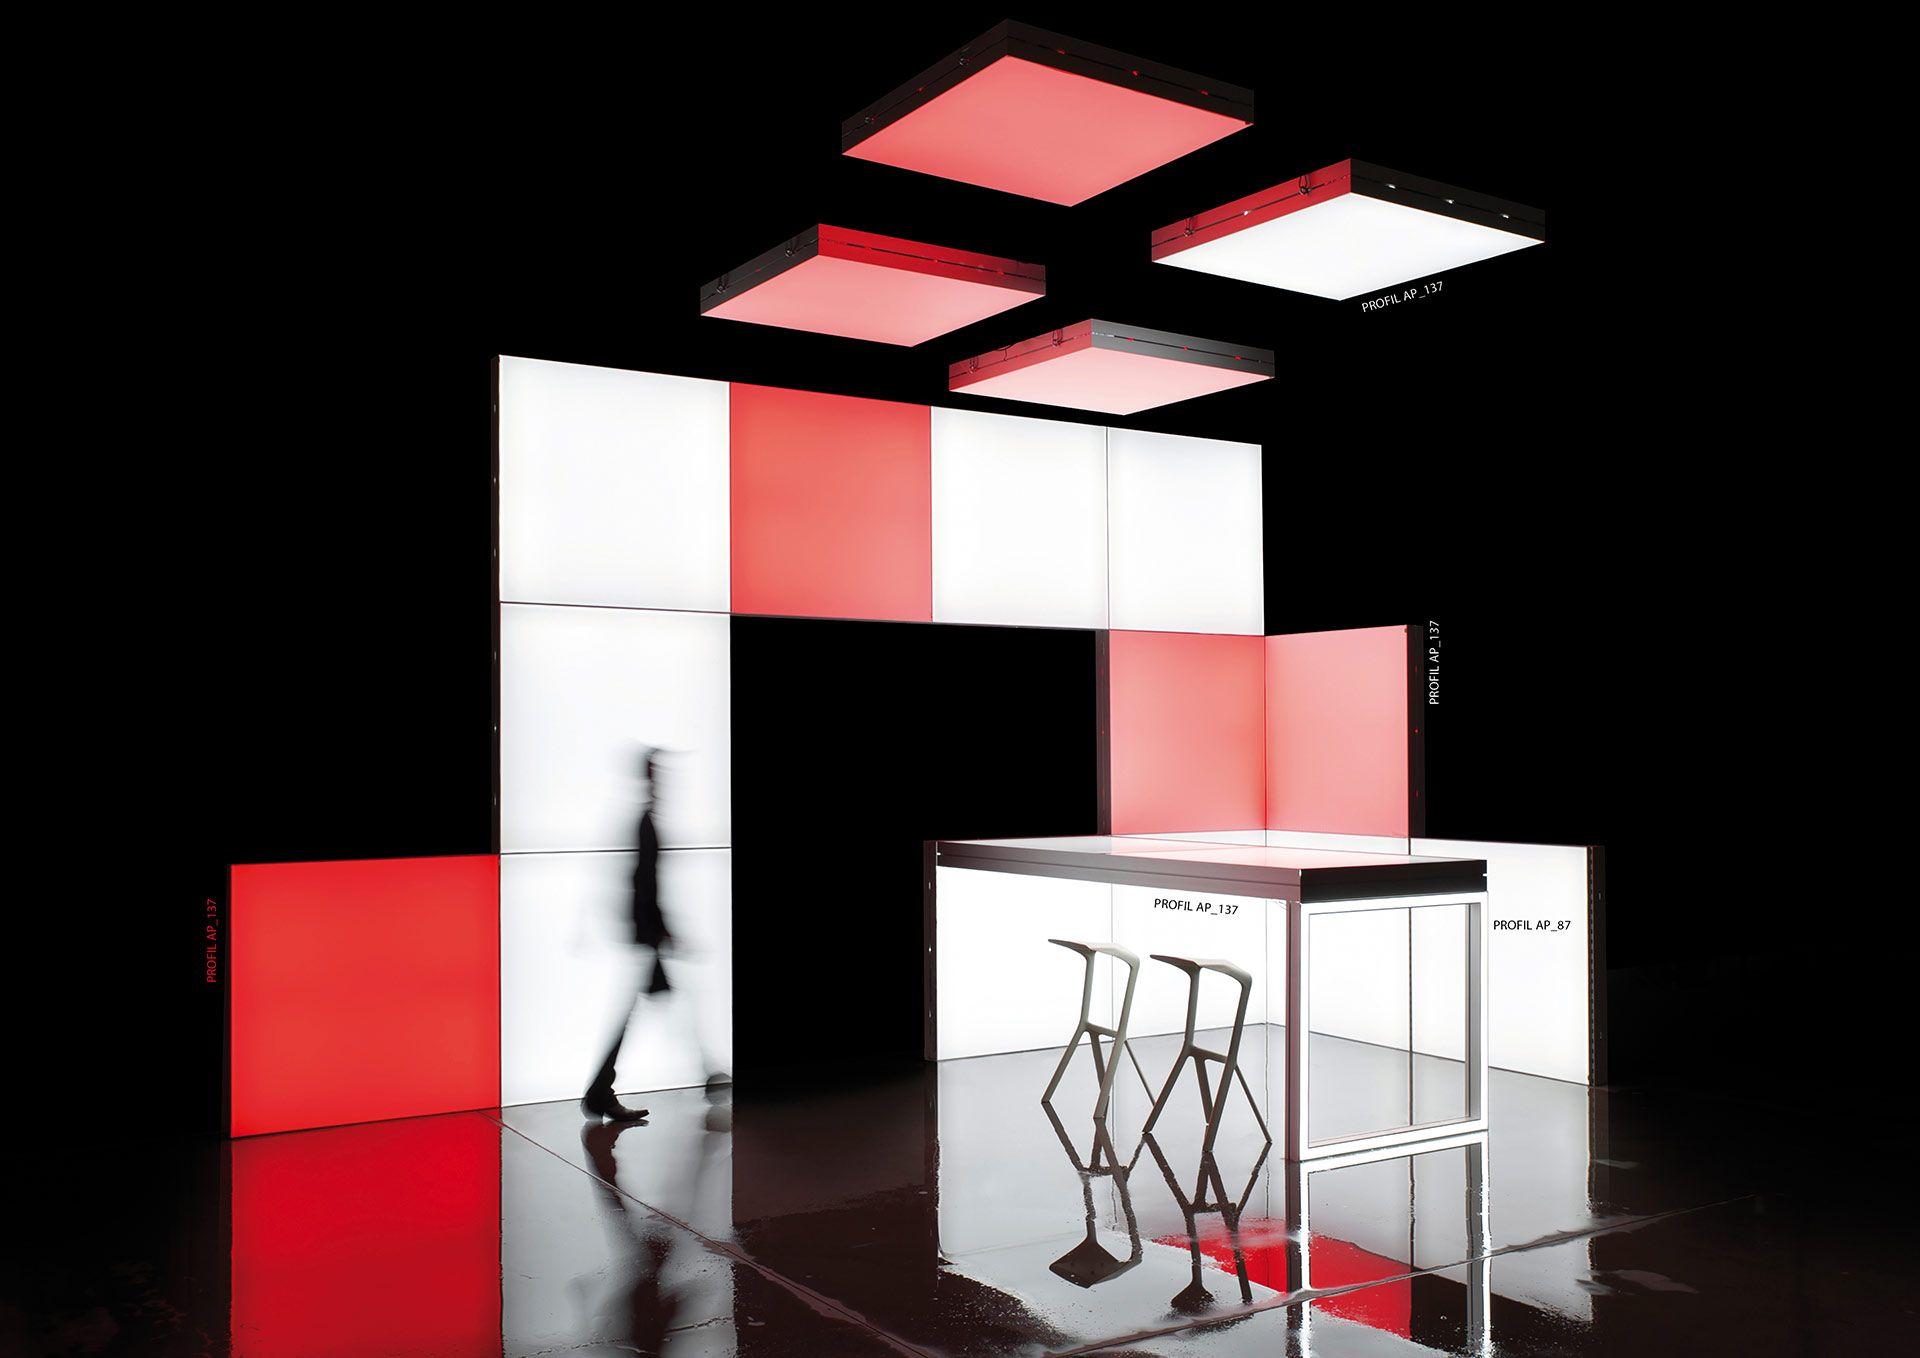 Lightbox Wall Frame Contour Table Modulap Modulare System Fur Visuelle Kommunikation Leicht Mobil Fur Messe Archit Messestand Design Messestand Messe